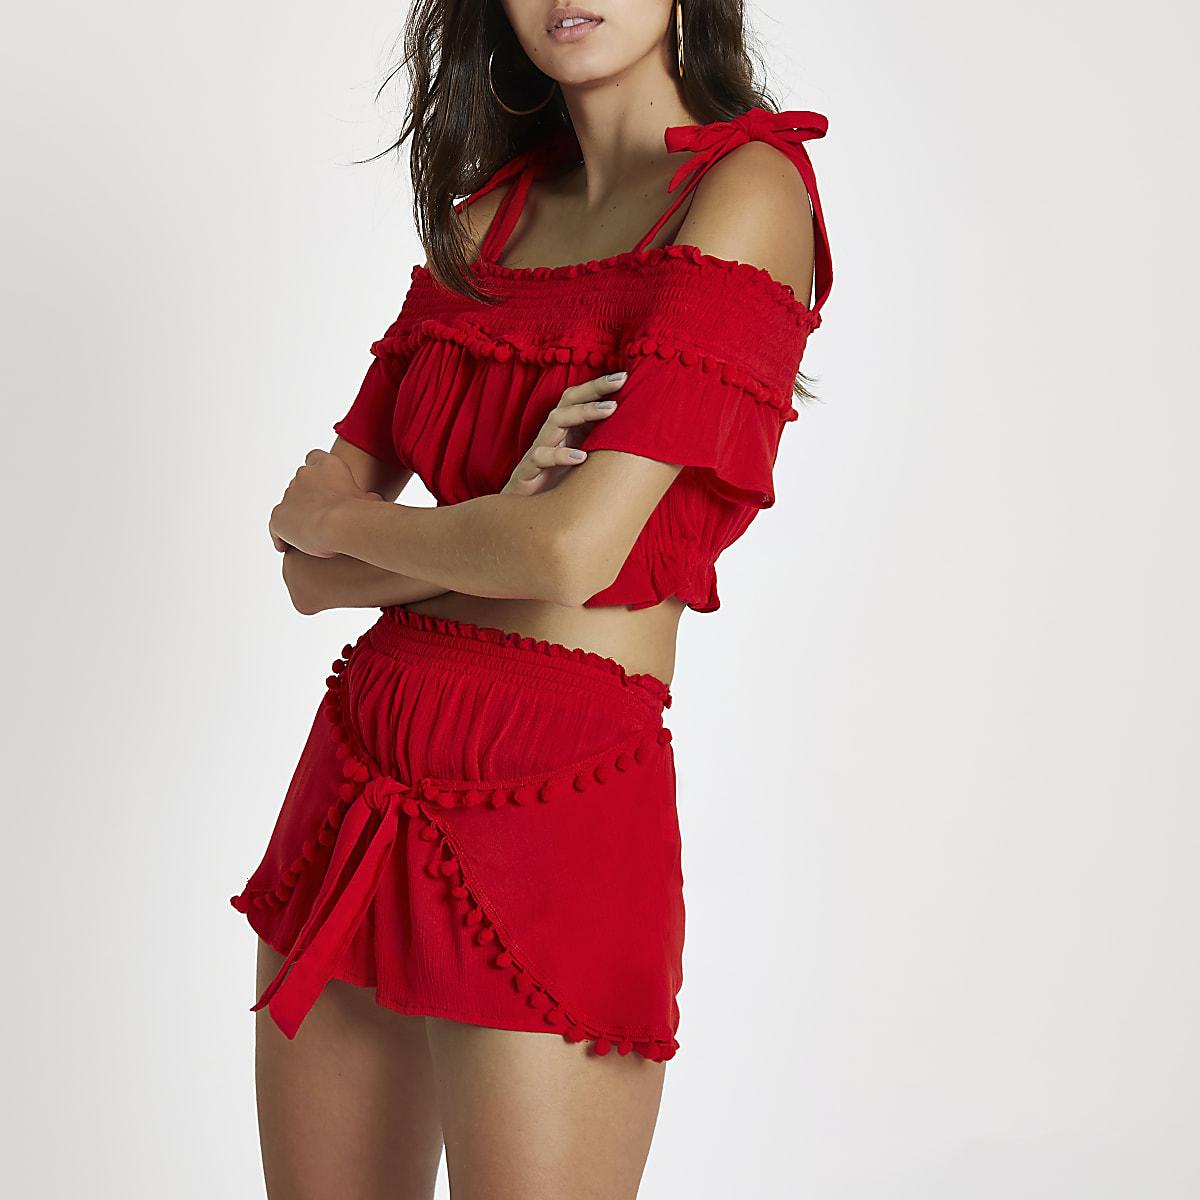 Red pom pom tie front beach shorts